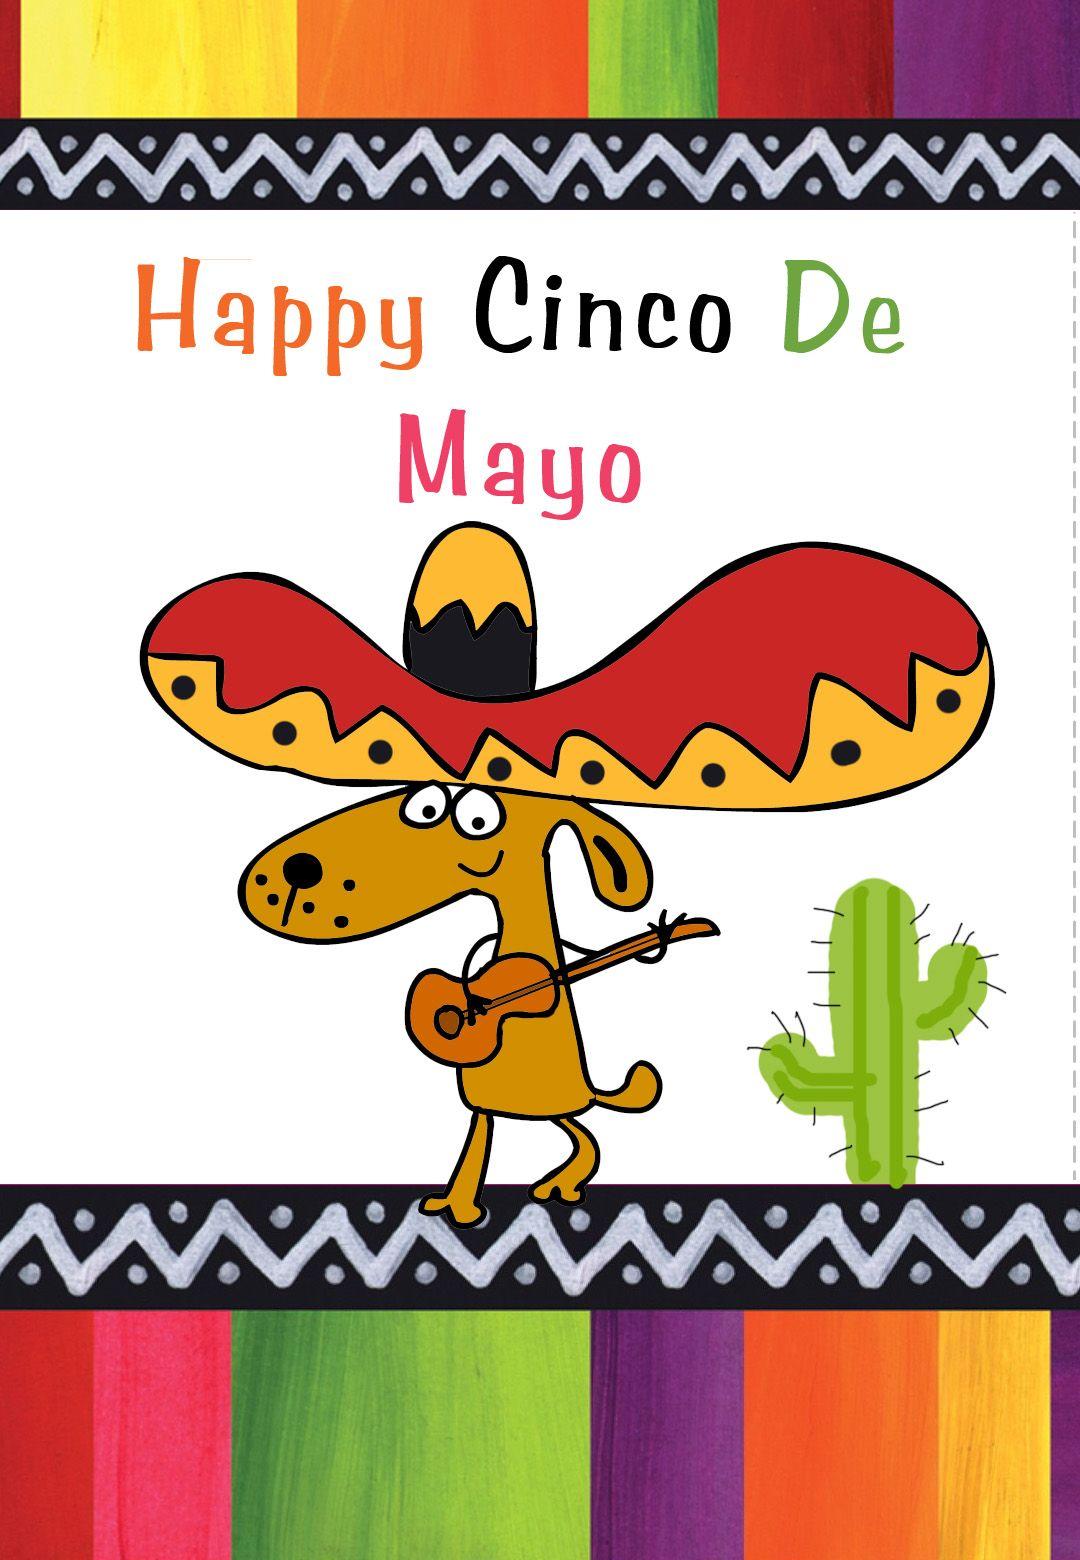 Free Printable Happy Cinco De Mayo Greeting Card Ciincodemayo